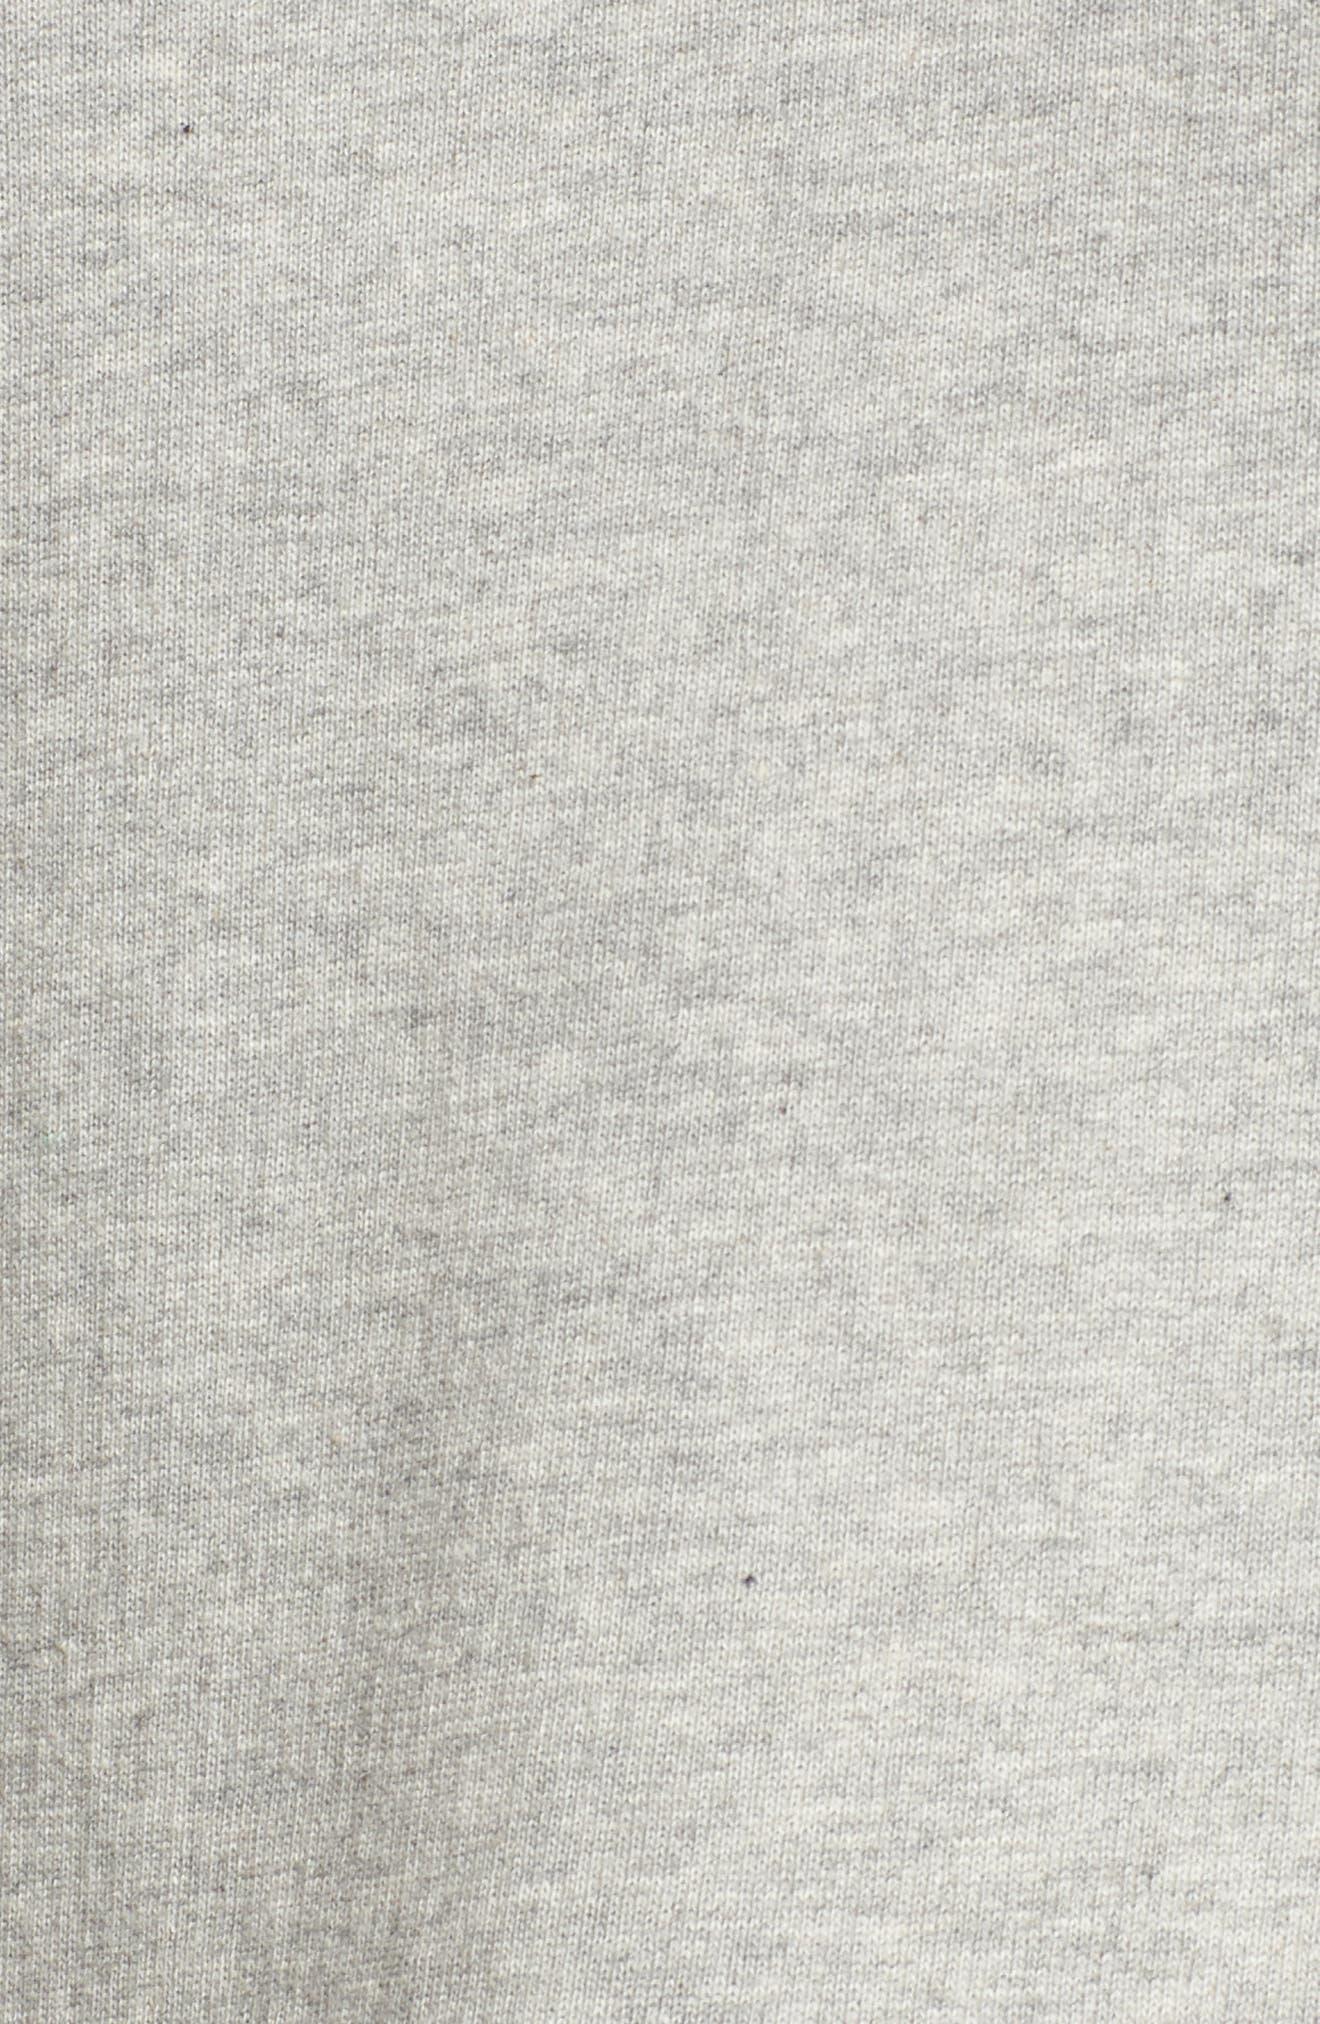 Ruffle Trim Sweatshirt,                             Alternate thumbnail 5, color,                             Heather Grey